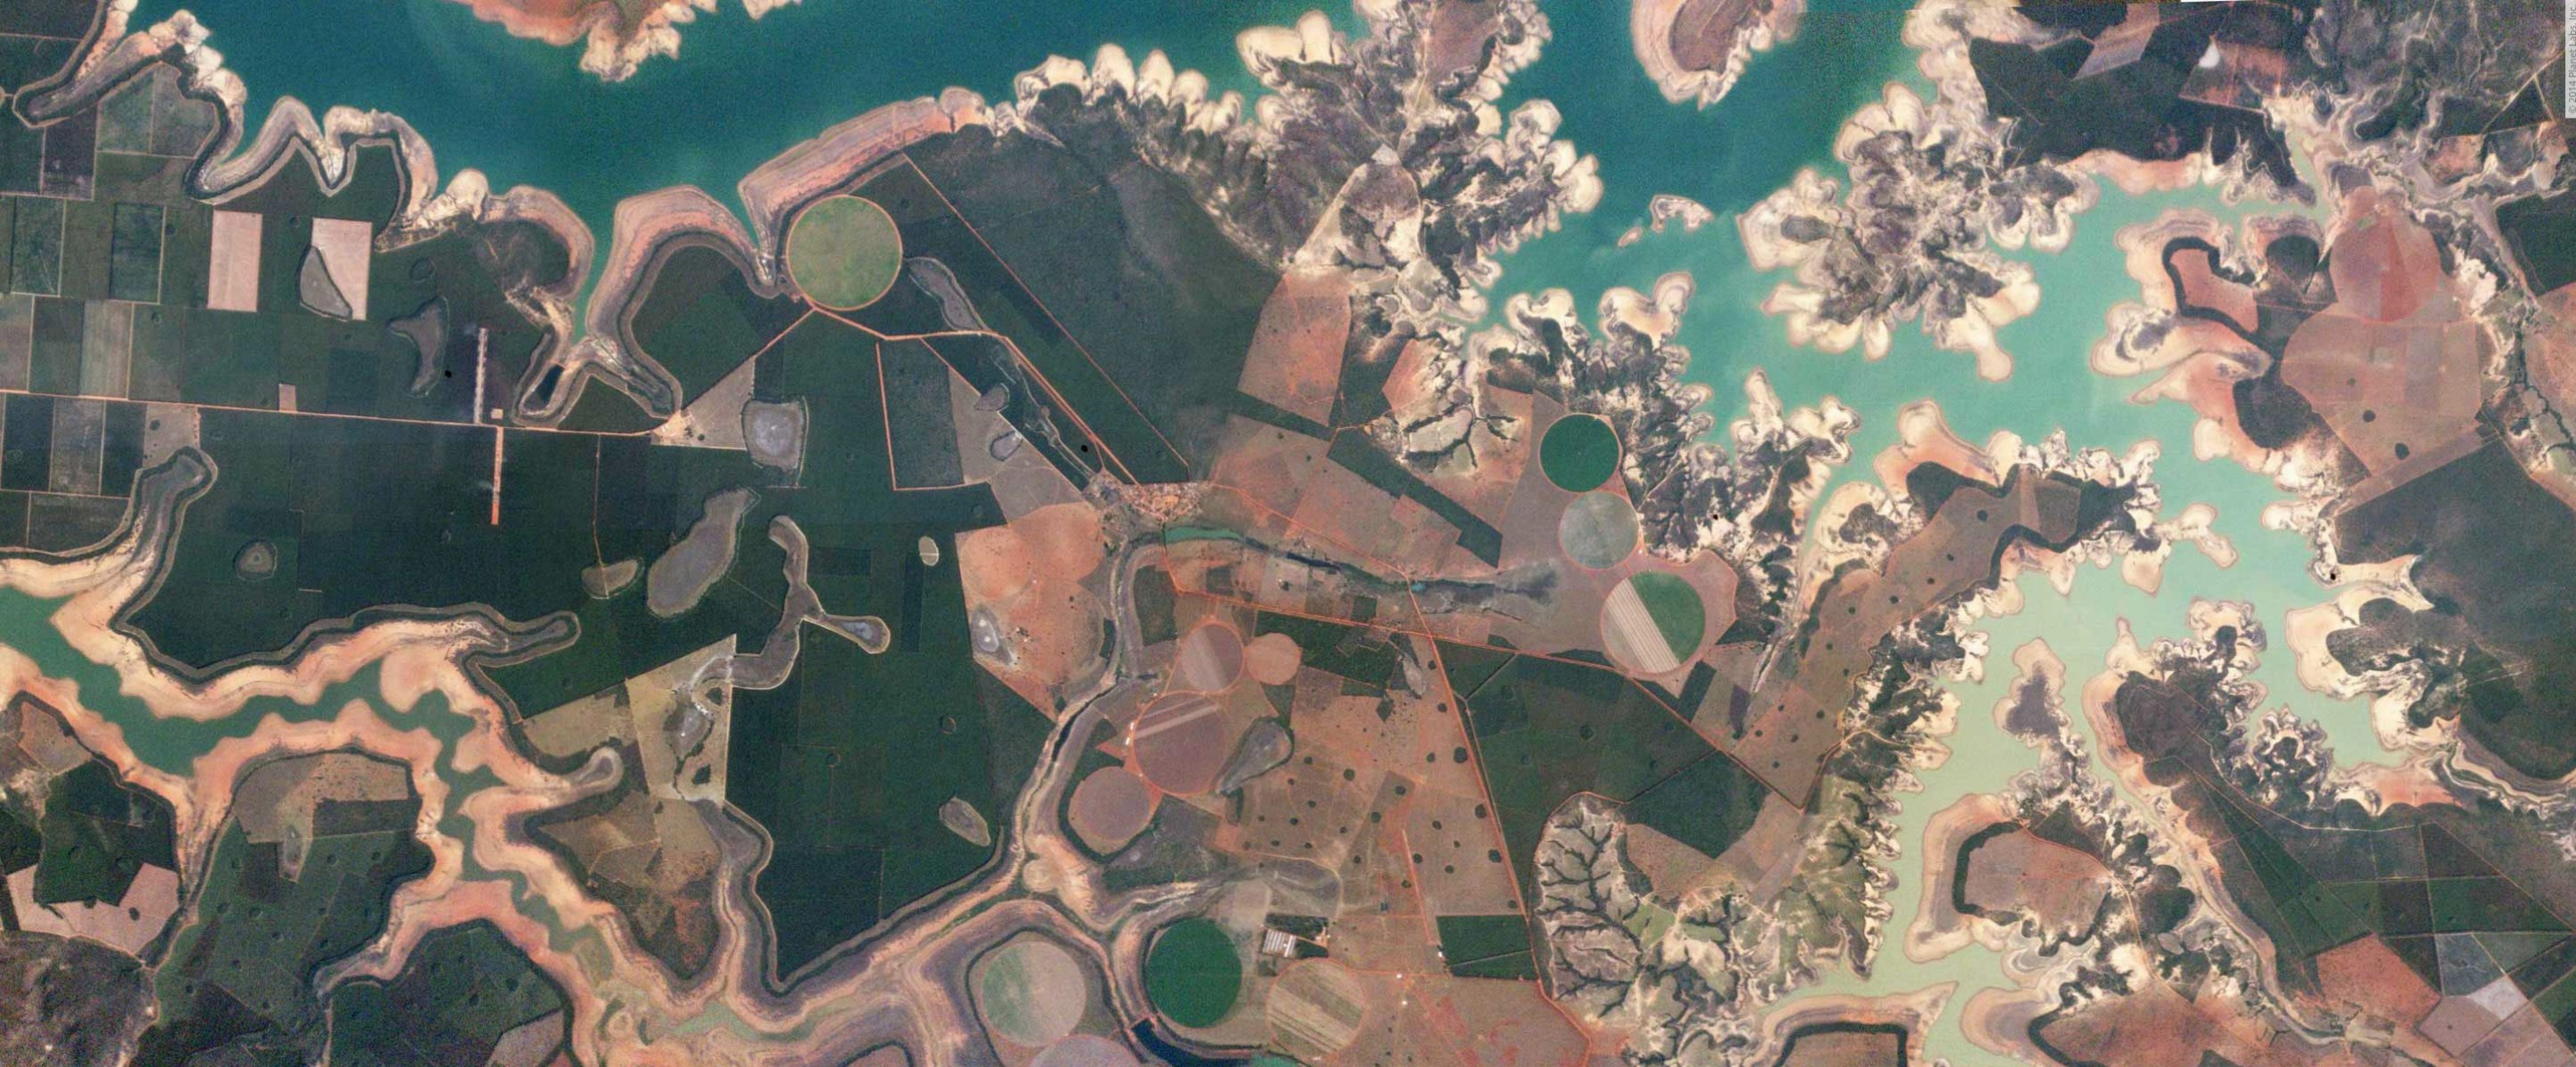 Brazil-Reservoir-Planet-Labs[1]